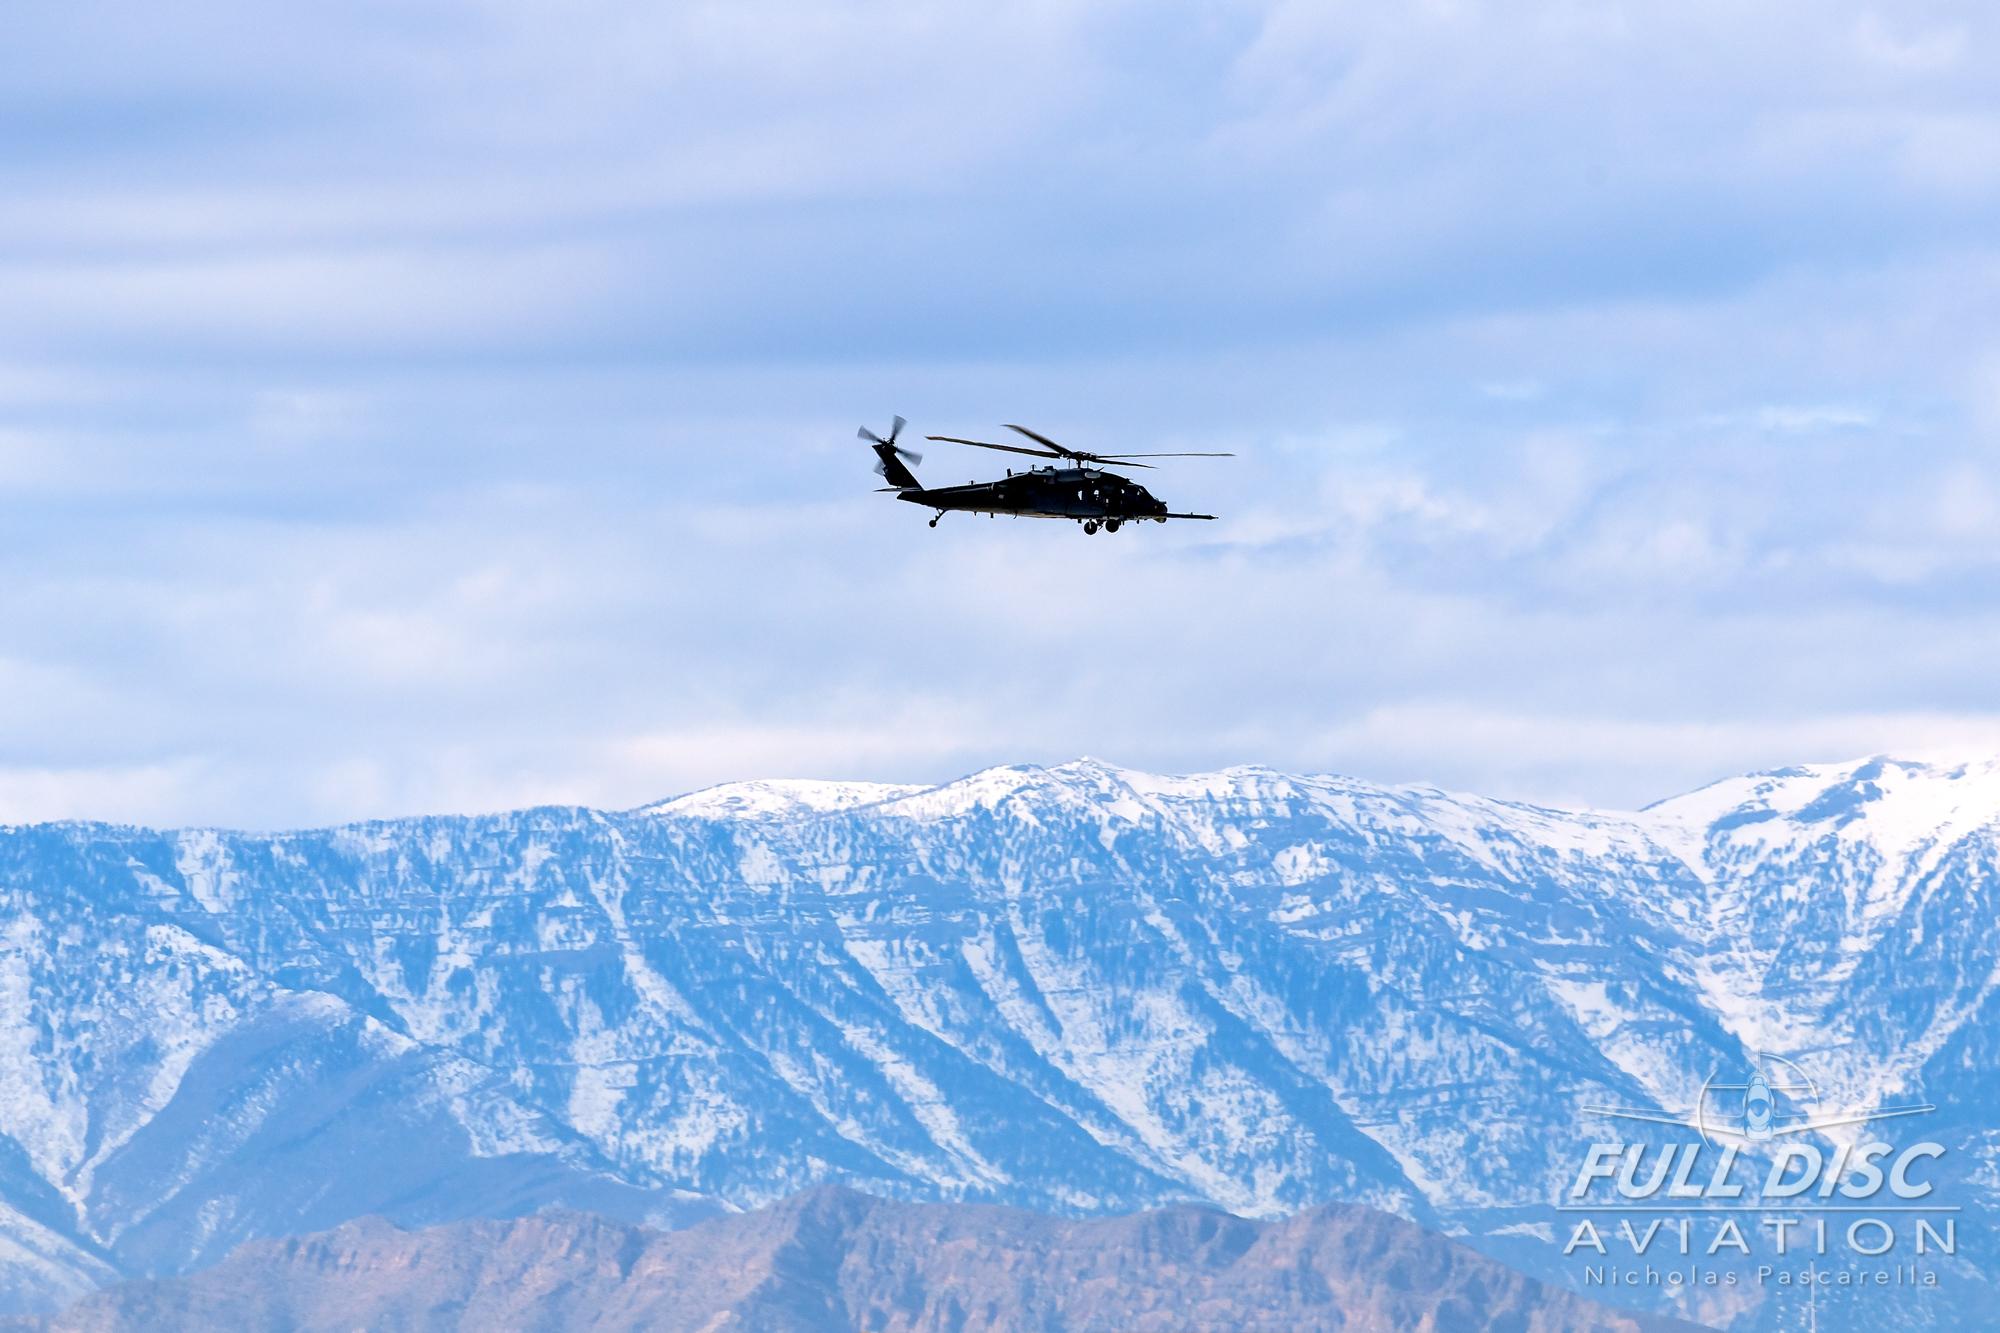 nickpascarella_nicholaspascarella_fulldiscaviation_aircraft_helicopter_nellis_mountains.jpg